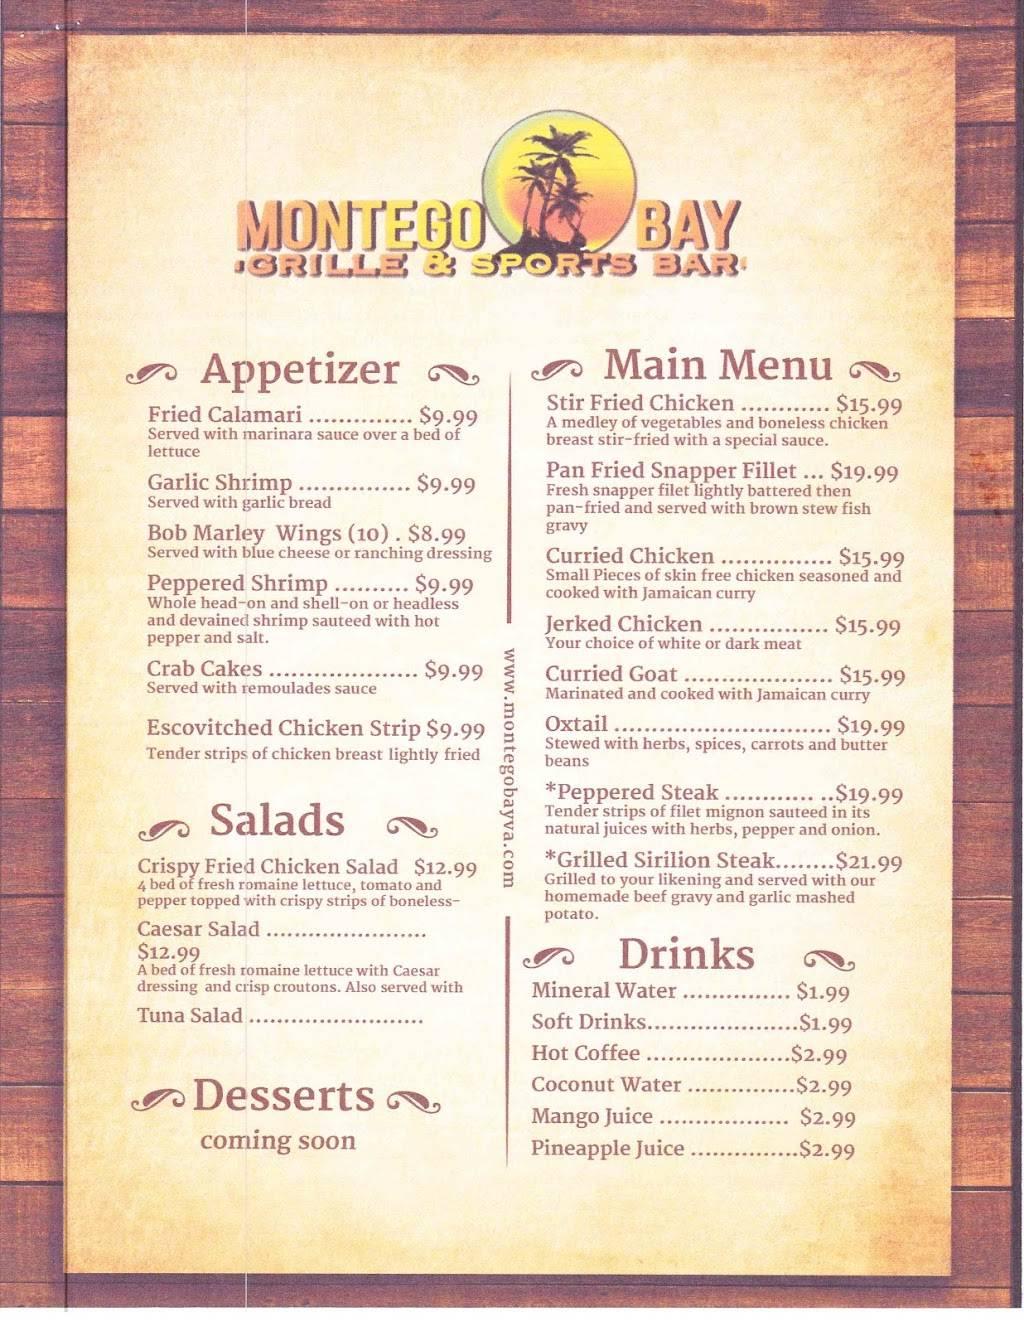 Montego Bay, Grille & Sports Bar | restaurant | 9915 Southpoint Pkwy, Fredericksburg, VA 22407, USA | 5712780045 OR +1 571-278-0045